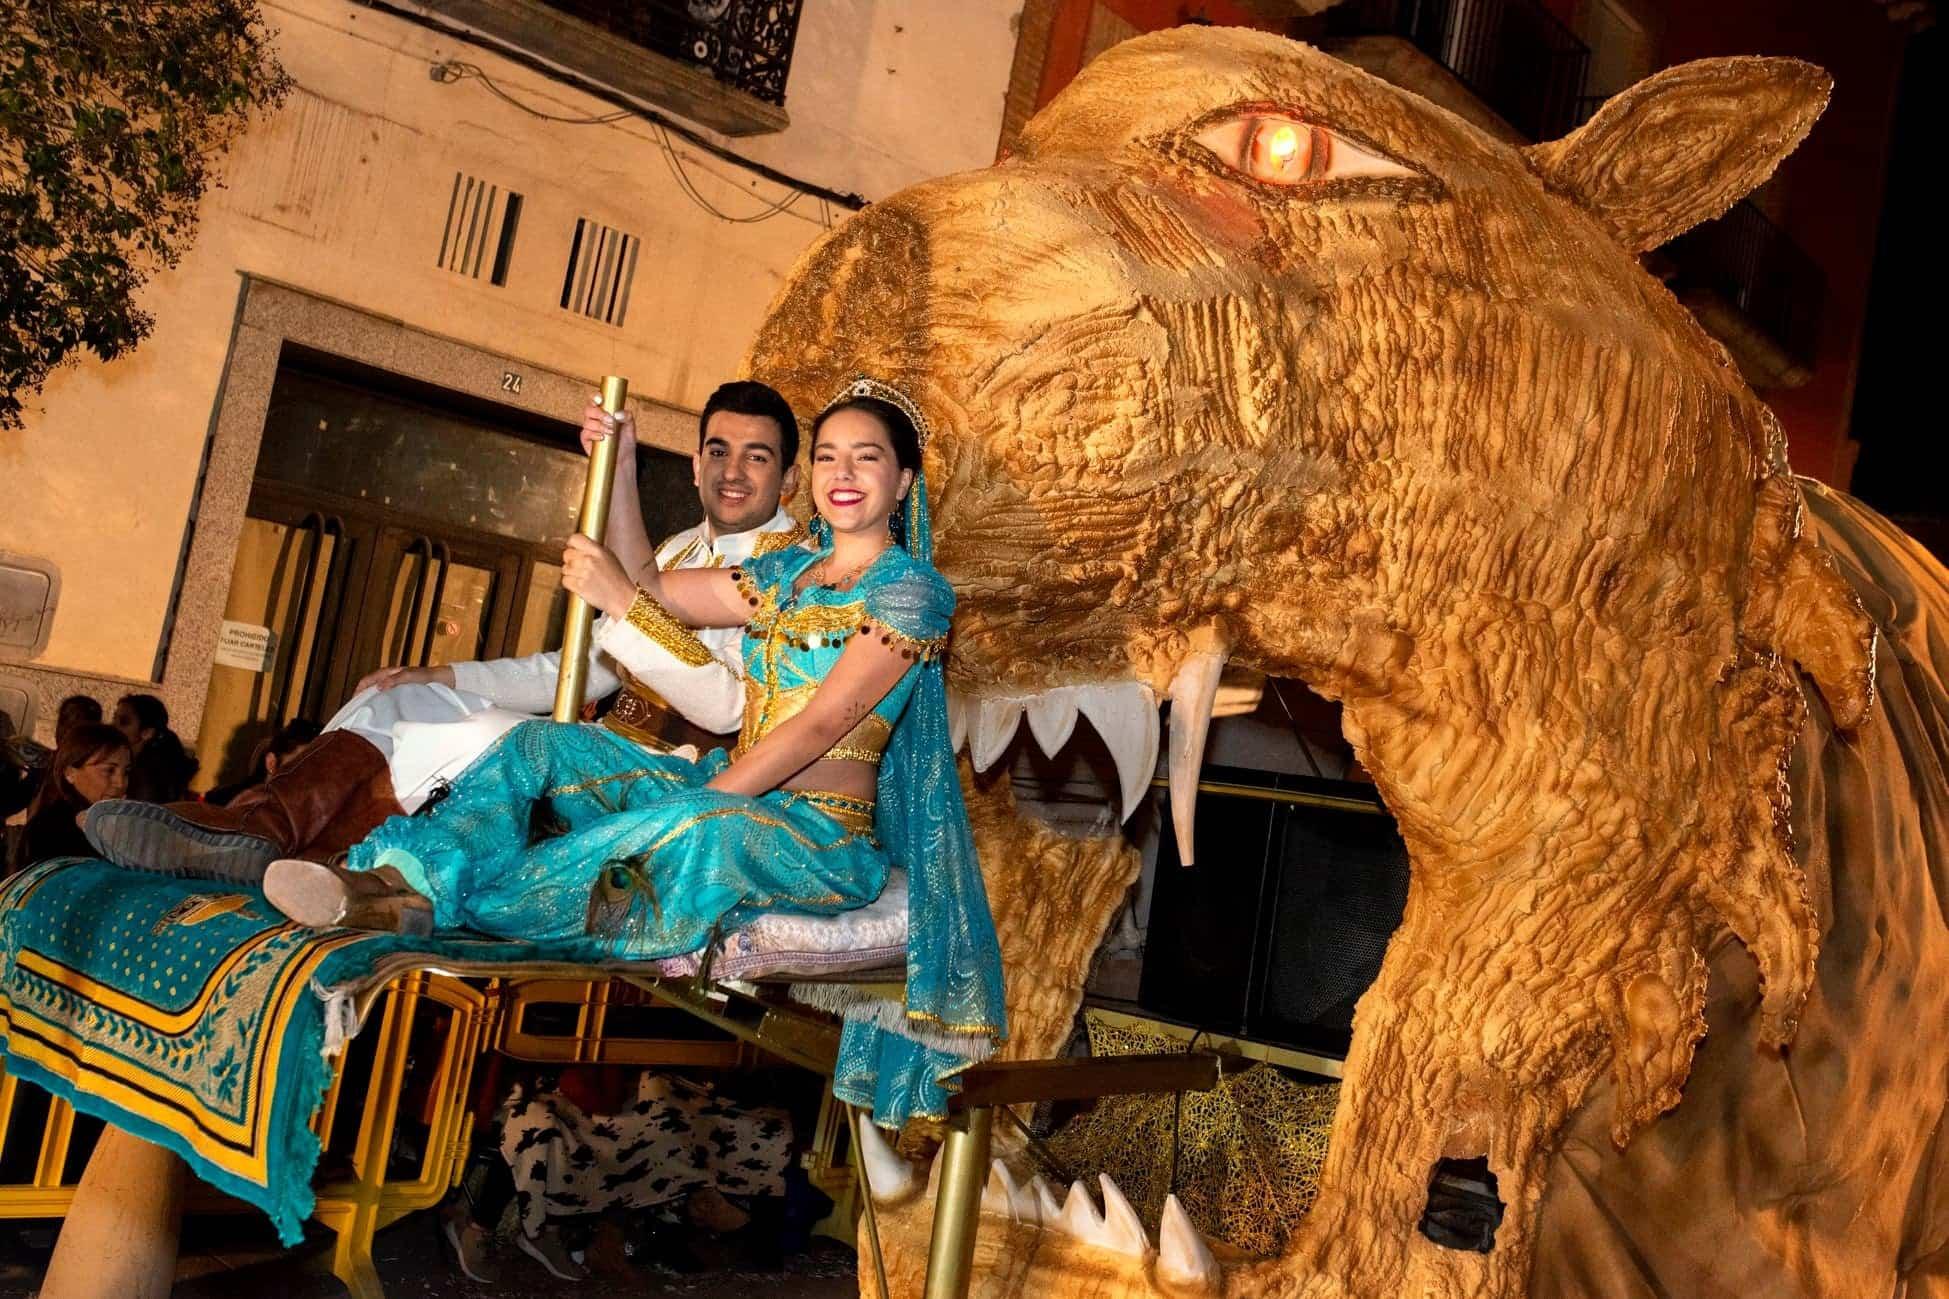 Carnaval de herencia 2020 ofertorio 28 - Selección de fotografías del Ofertorio del Carnaval de Herencia